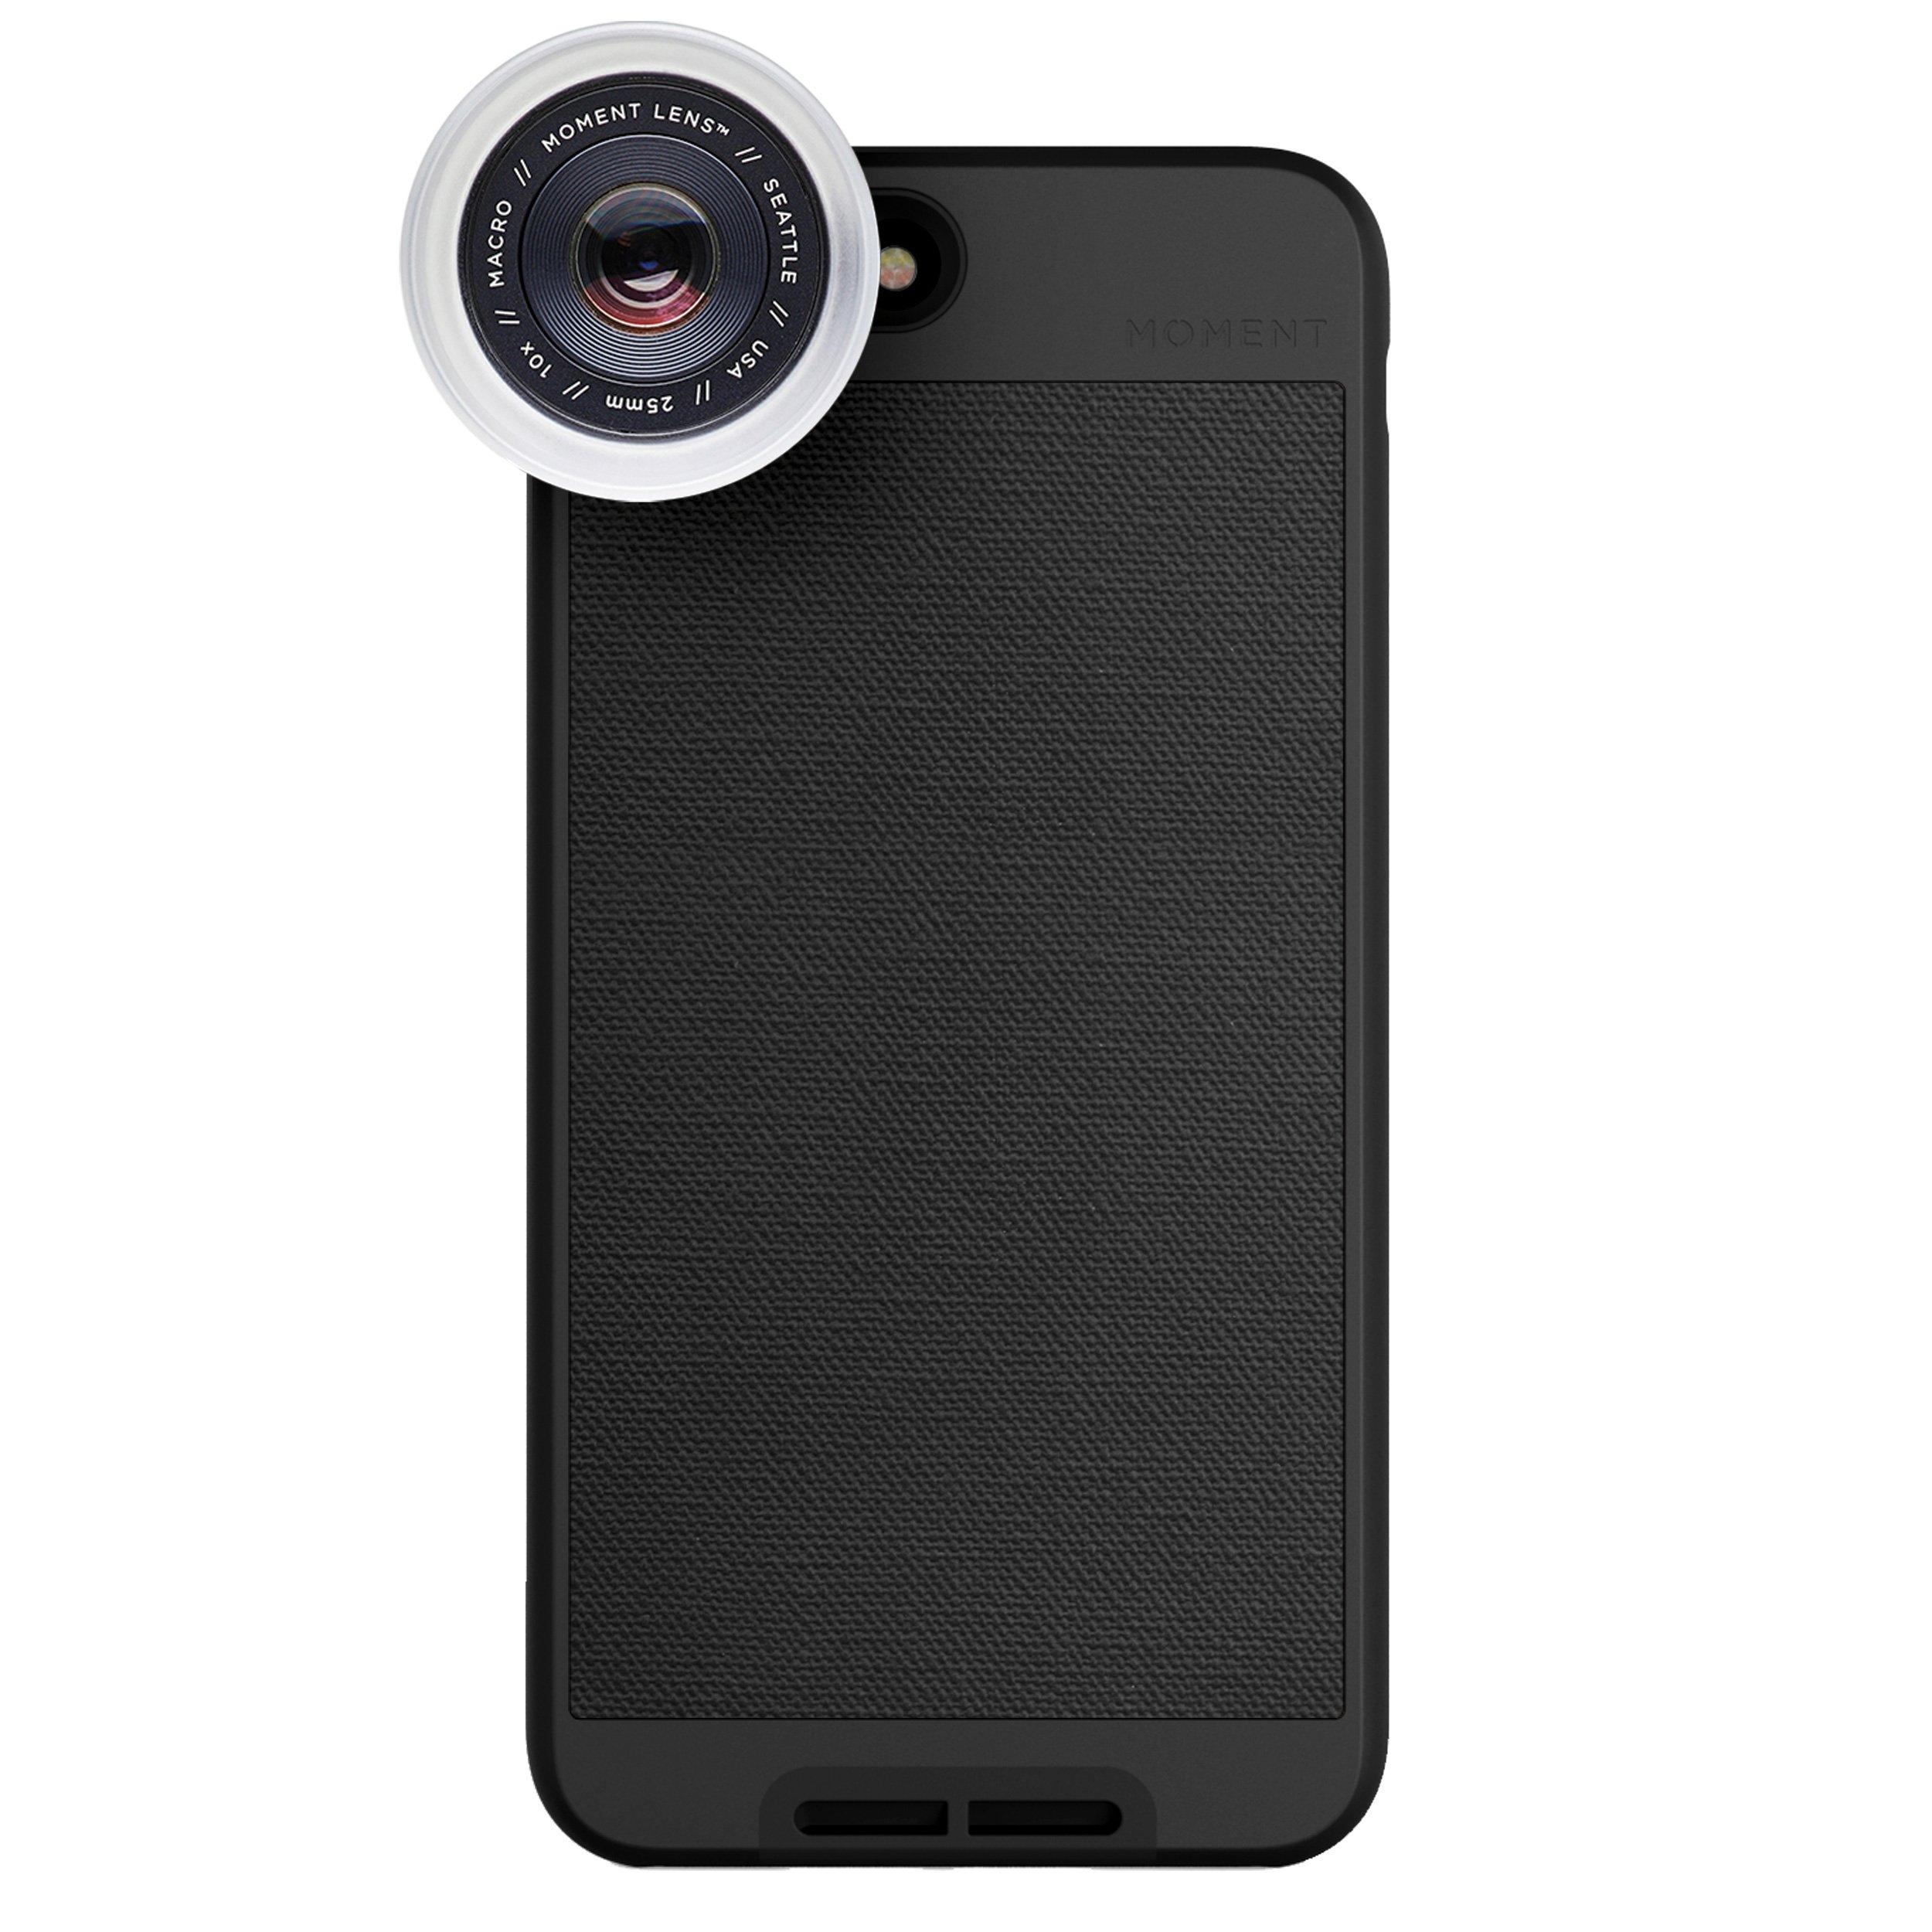 iPhone 8 Plus / iPhone 7 Plus Case with Macro Lens Kit || Moment Black Canvas Photo Case plus Macro Lens || Best iphone macro attachment lens with thin protective case.